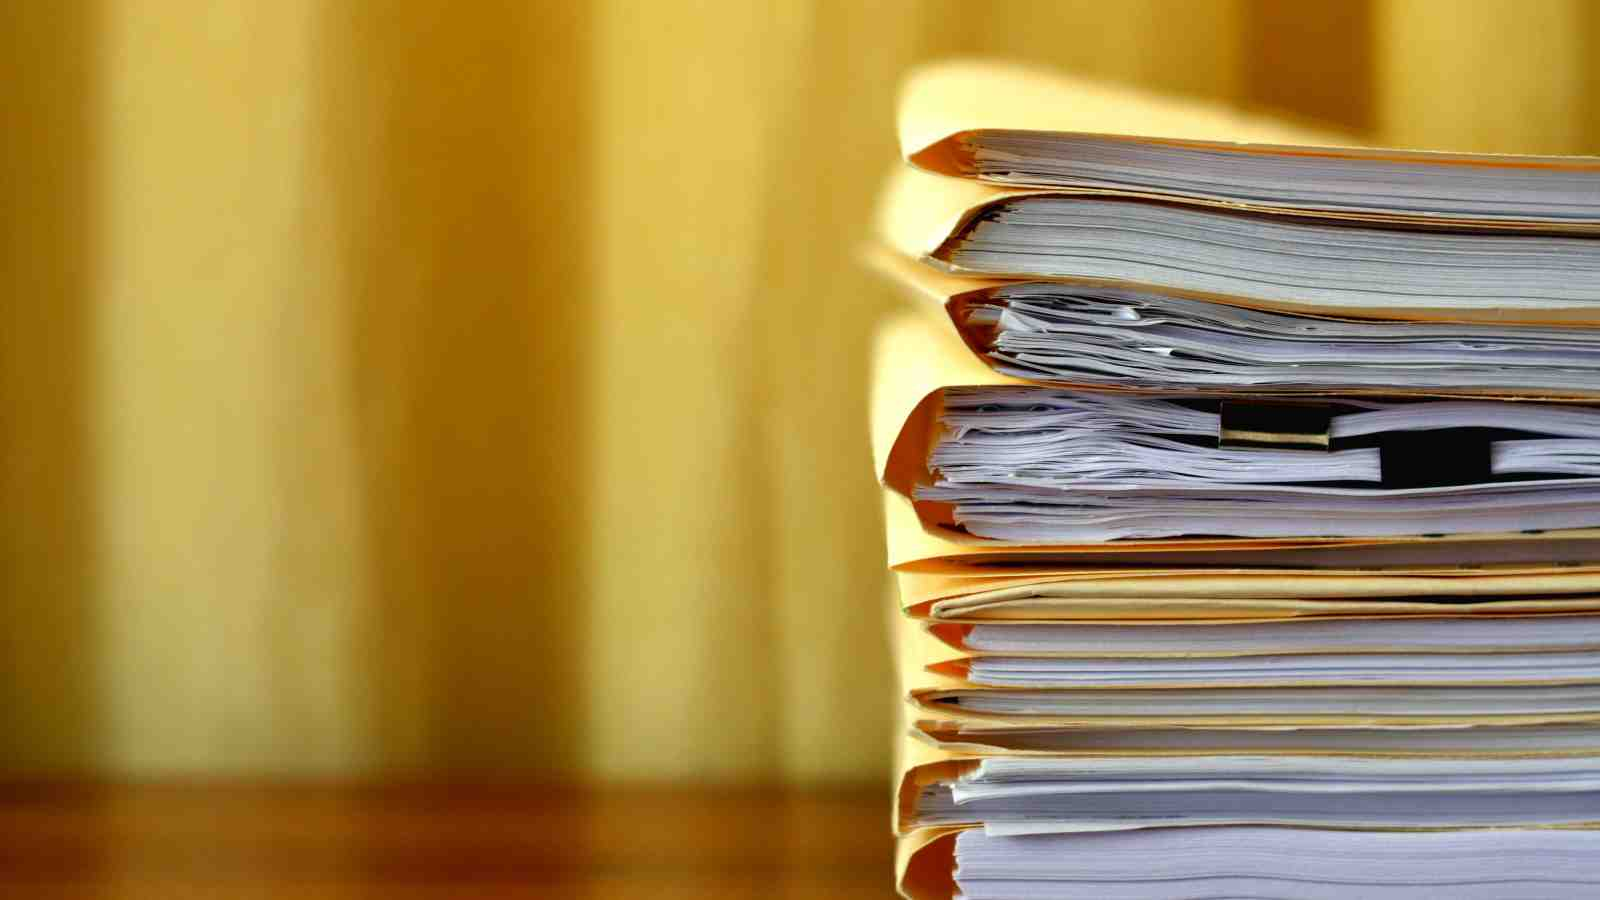 case files on a desk